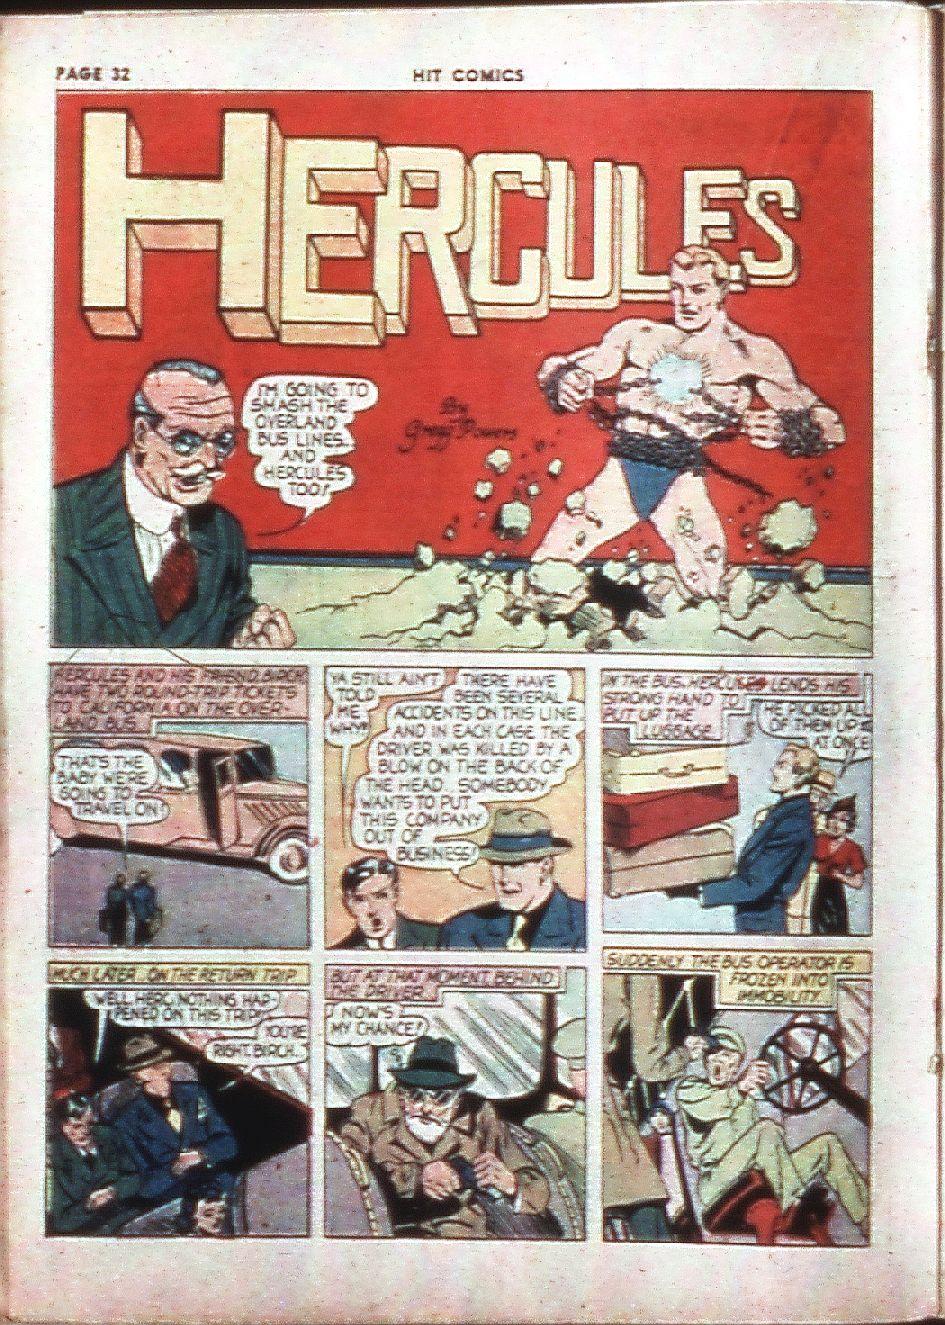 Read online Hit Comics comic -  Issue #4 - 34